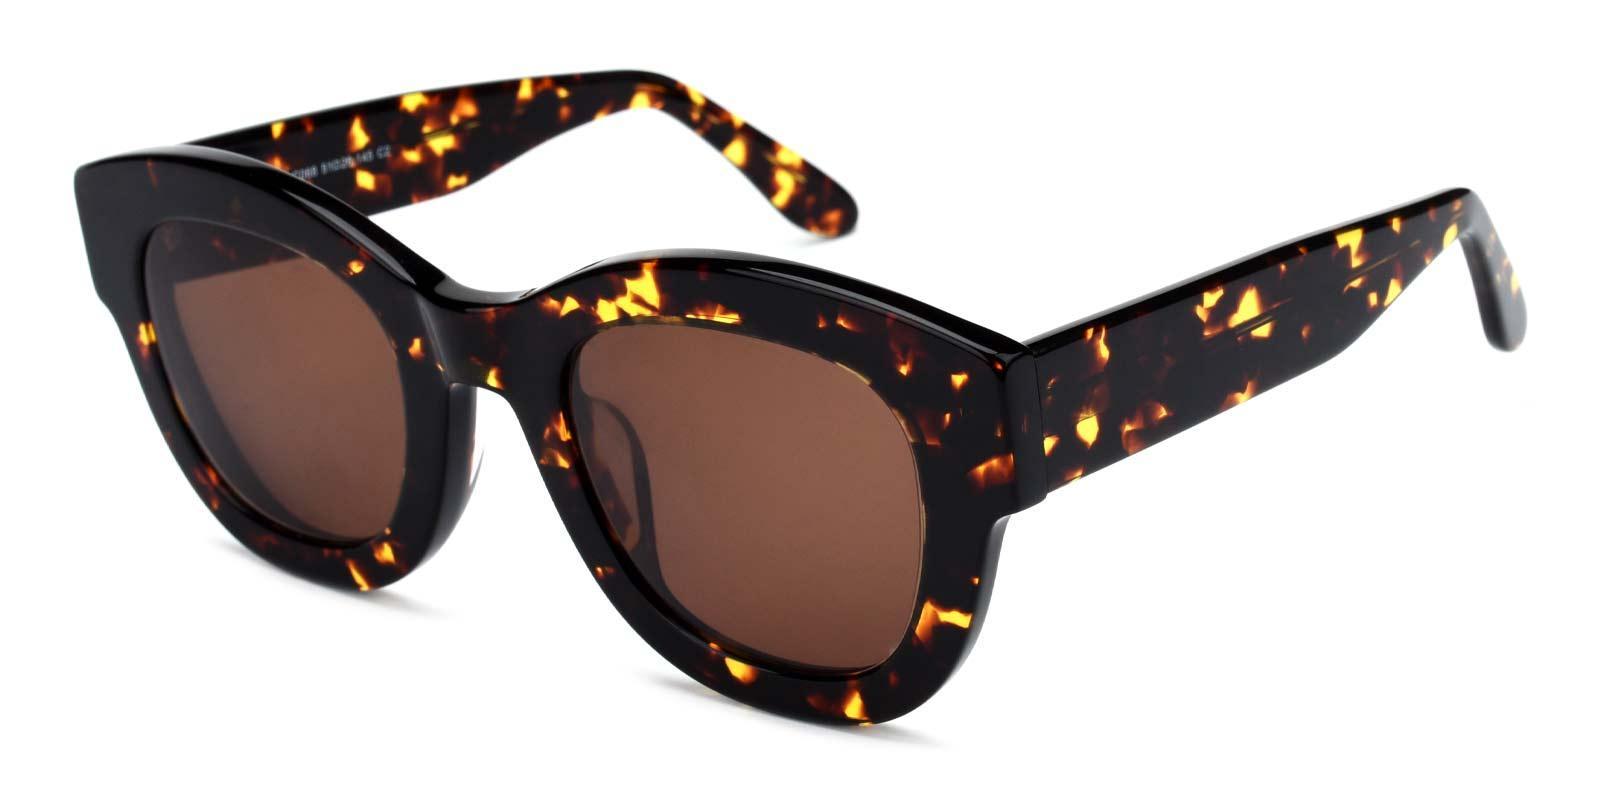 Egypt-Tortoise-Cat-Acetate-Sunglasses-additional1